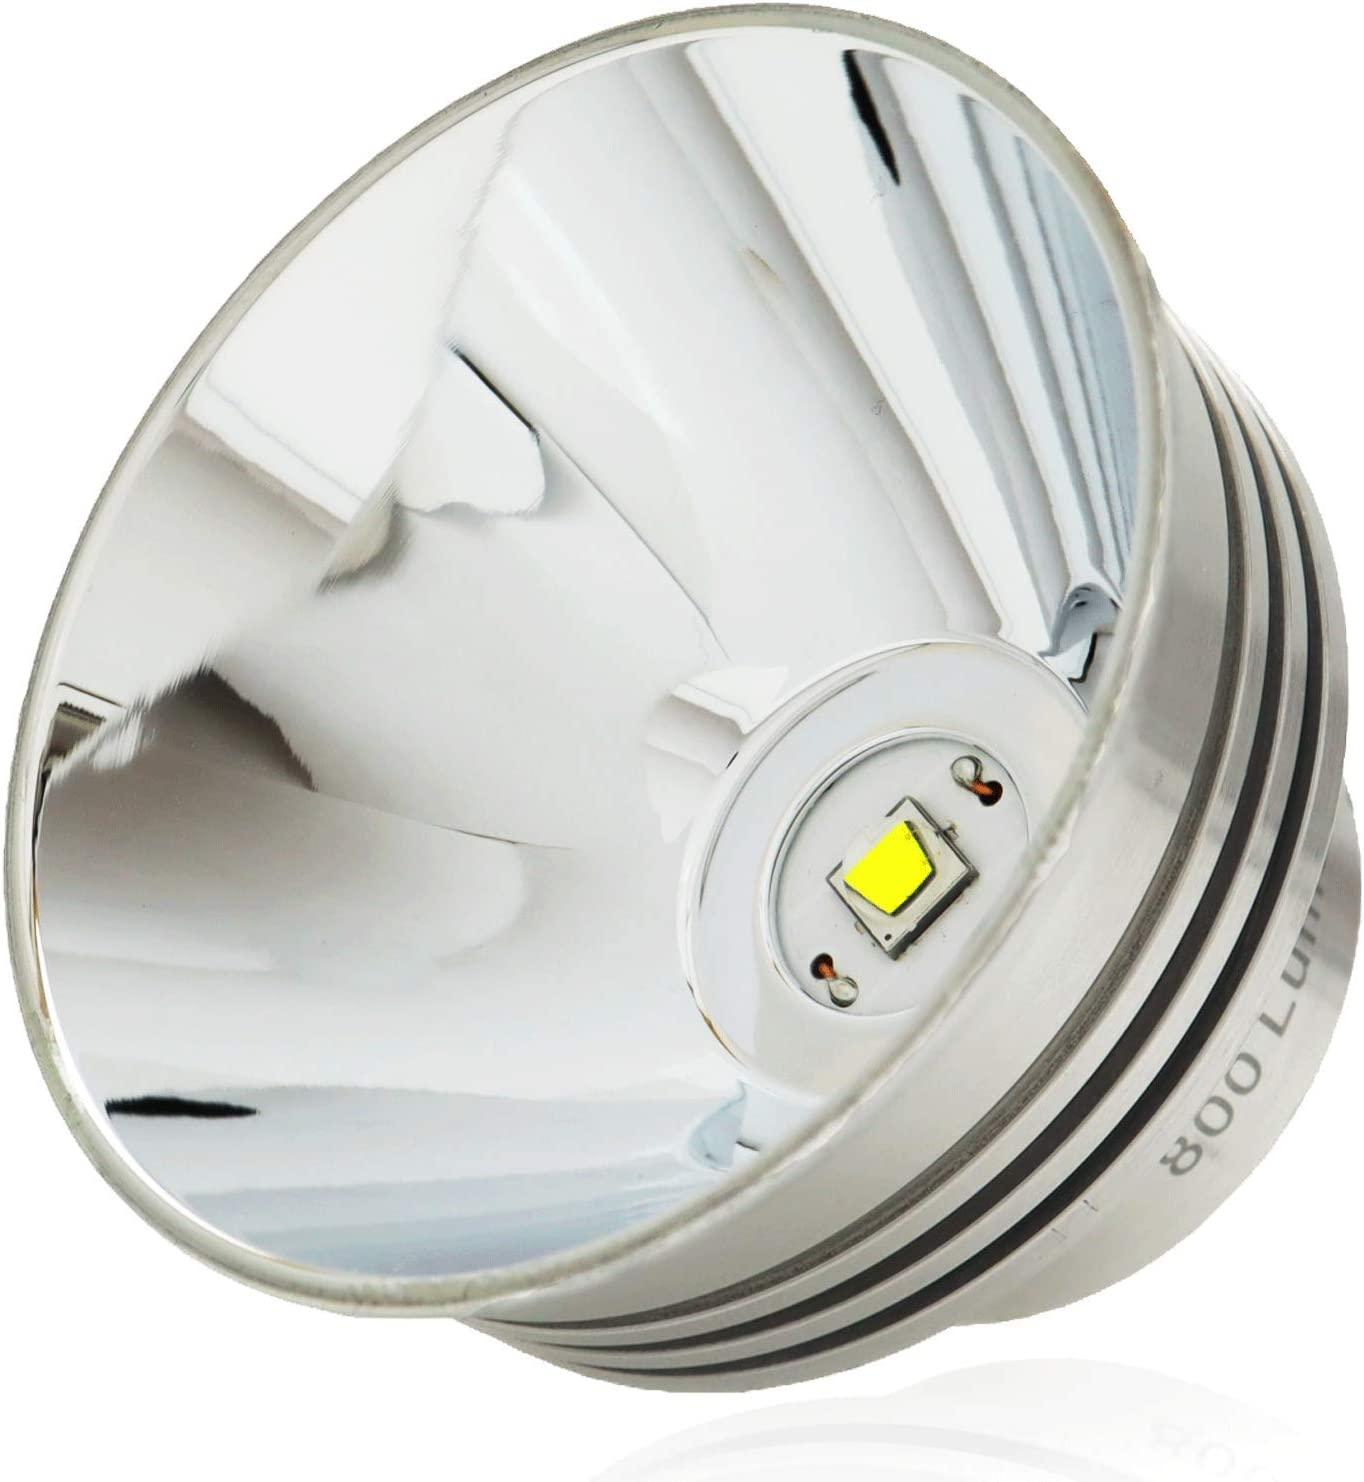 Maglite LED Conversion 800 lumen 3 4 5 6 D celdas -3 niveles